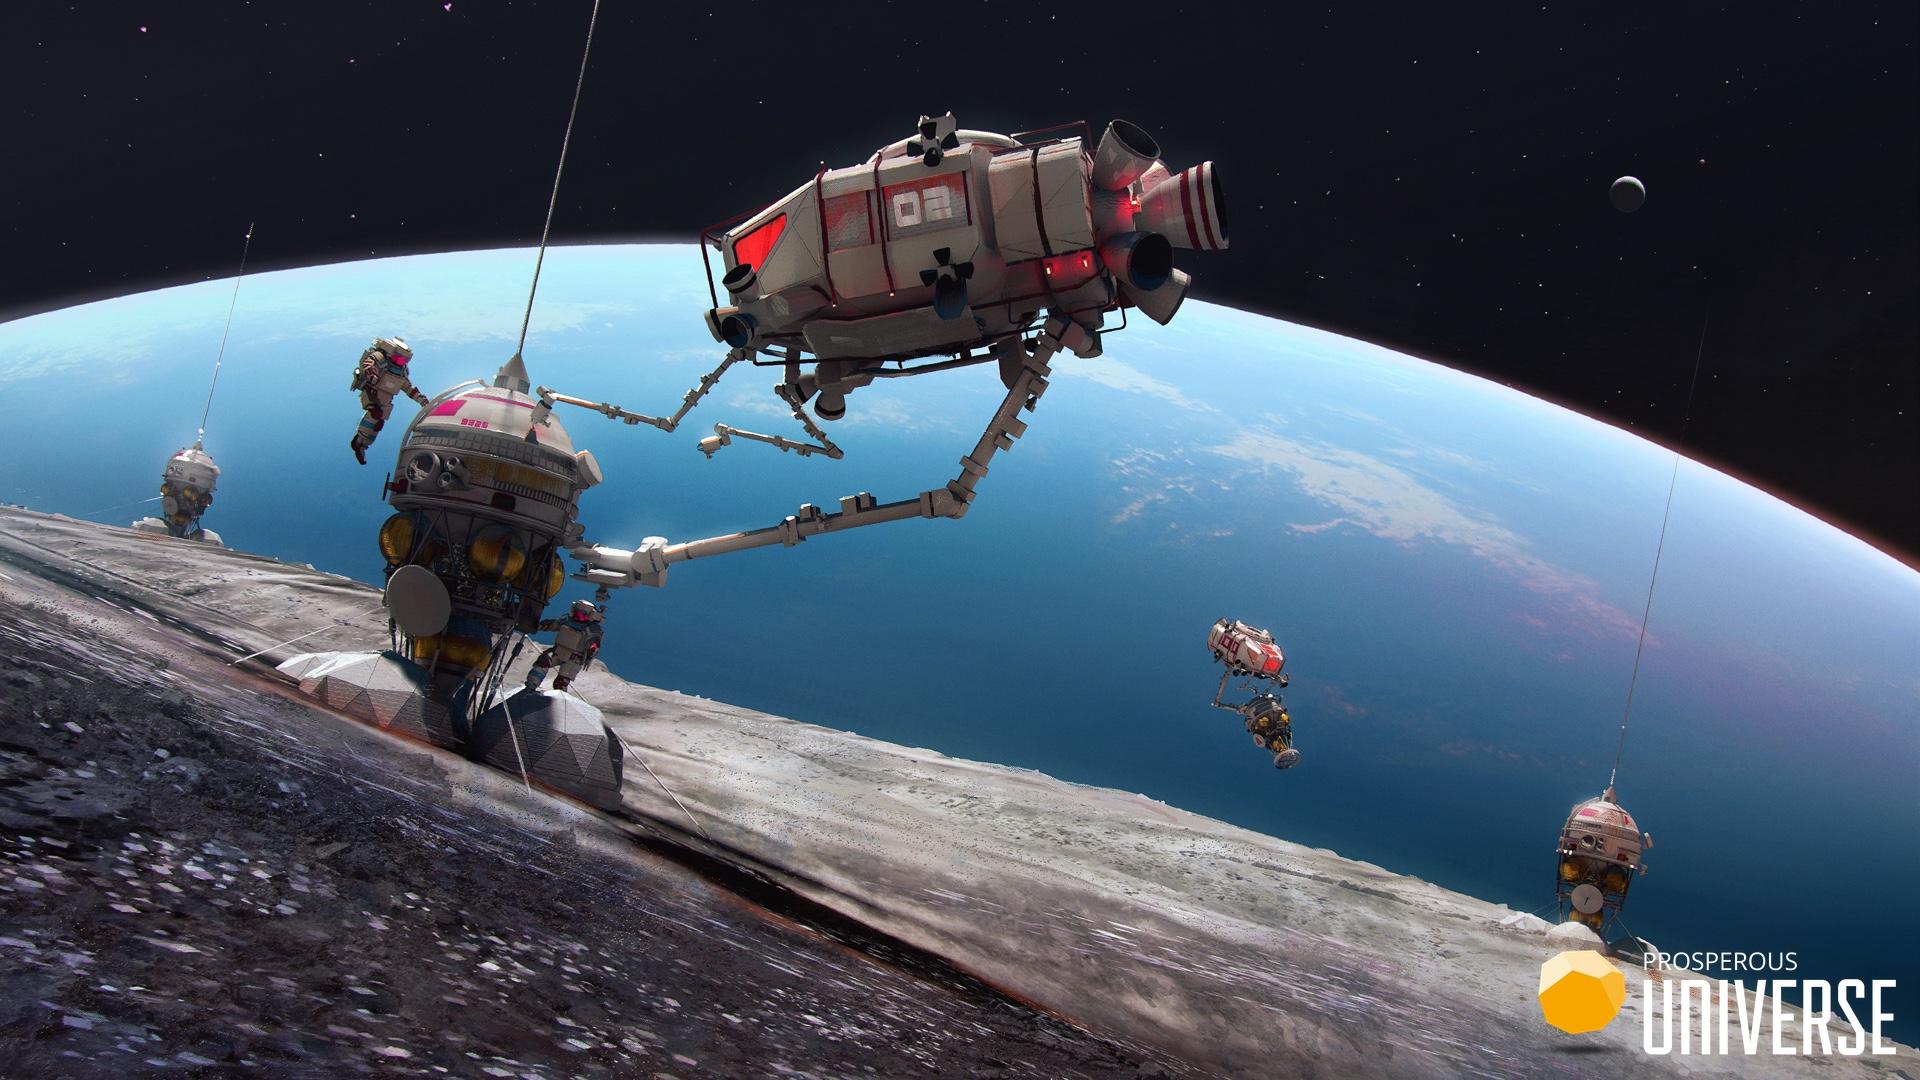 Prosperous_Universe_-_concept_art_-_asteroid_day_2020.jpg